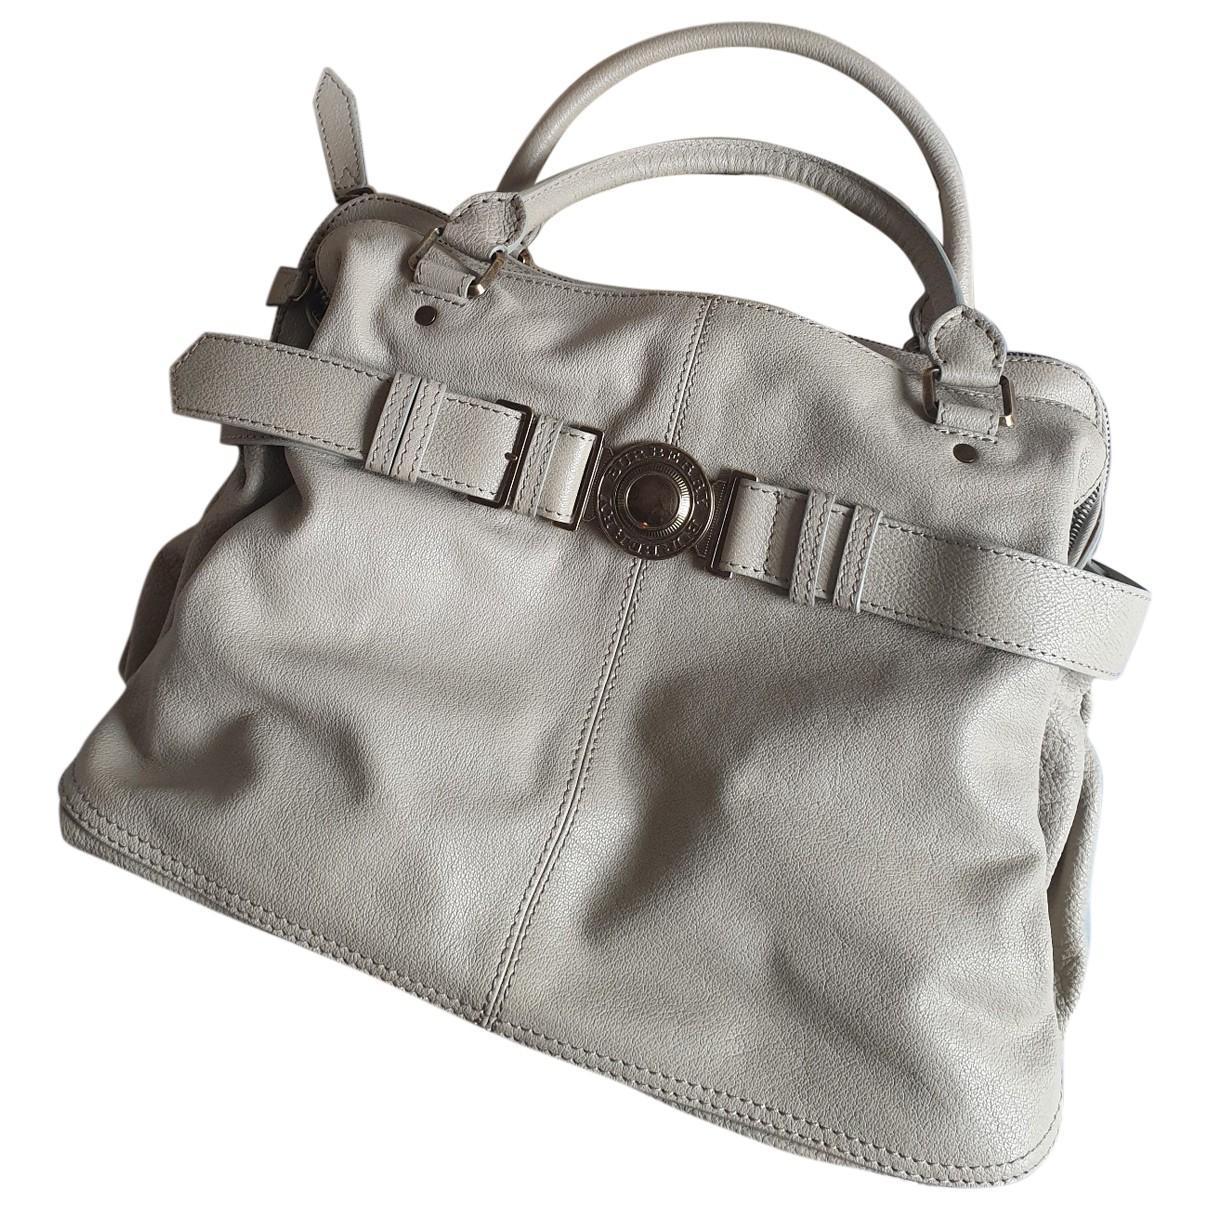 Burberry N Ecru Leather handbag for Women N